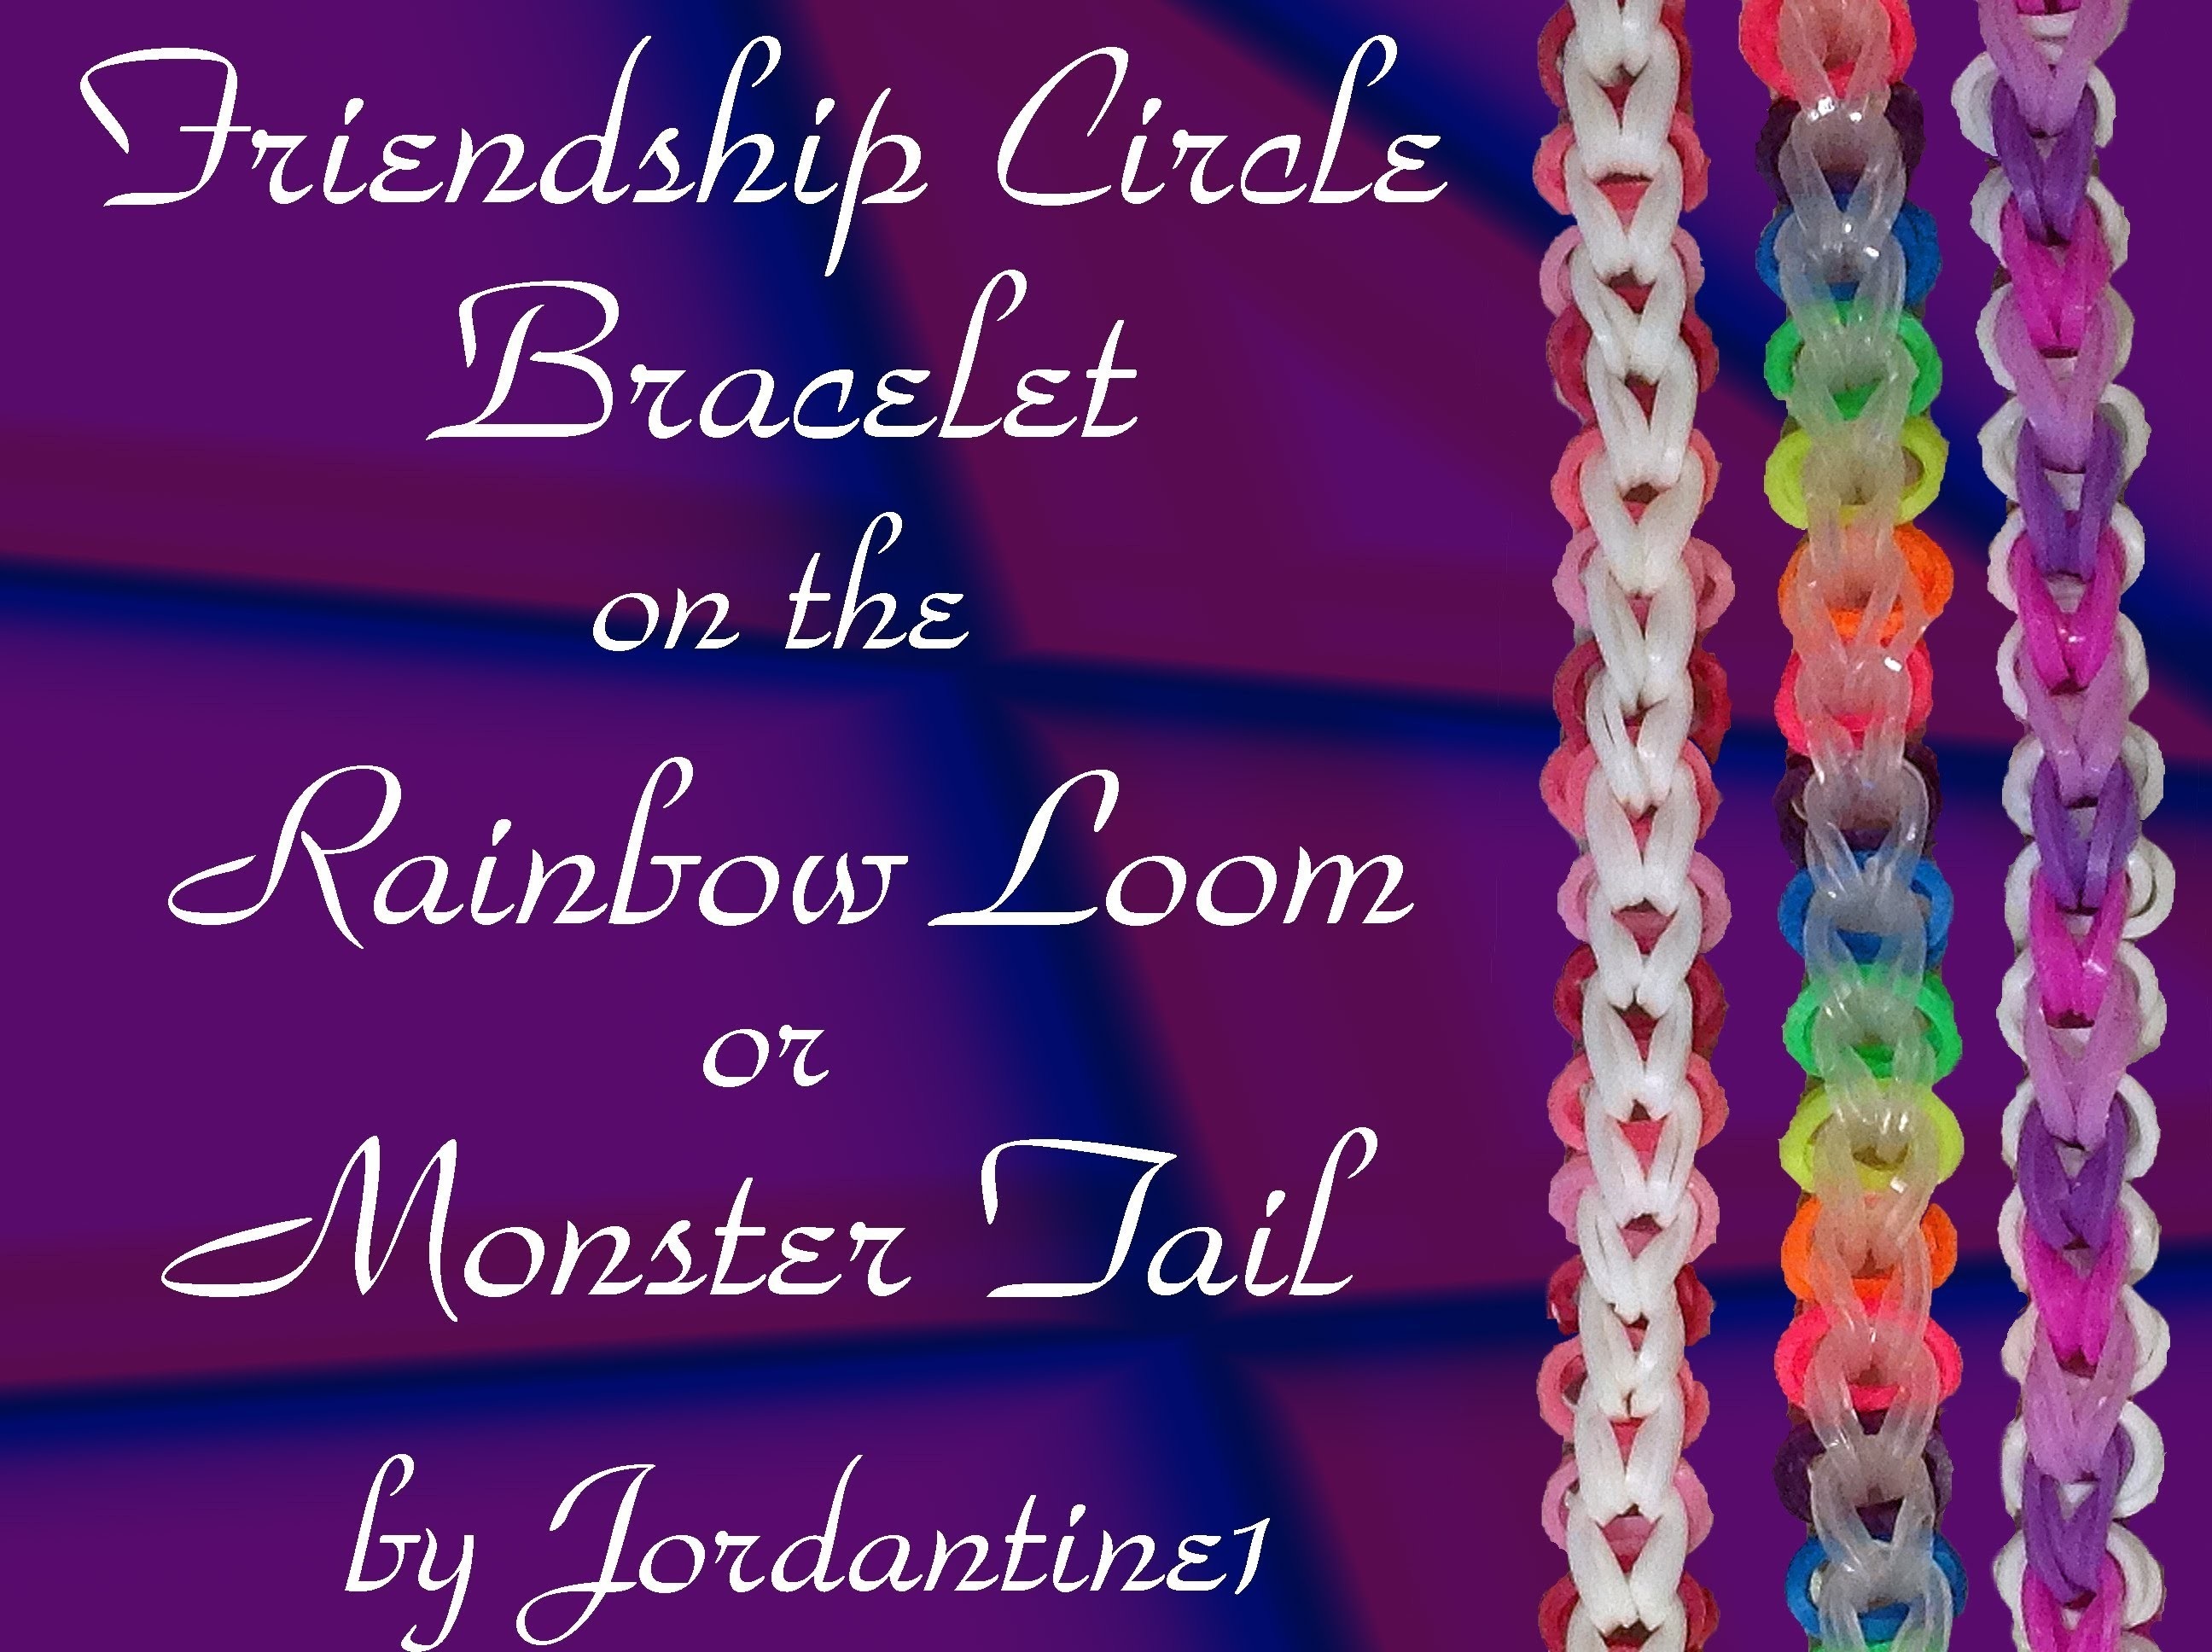 New Friendship Circle Bracelet- Rainbow Loom,  Monster Tail, Crazy Loom, Wonder Loom